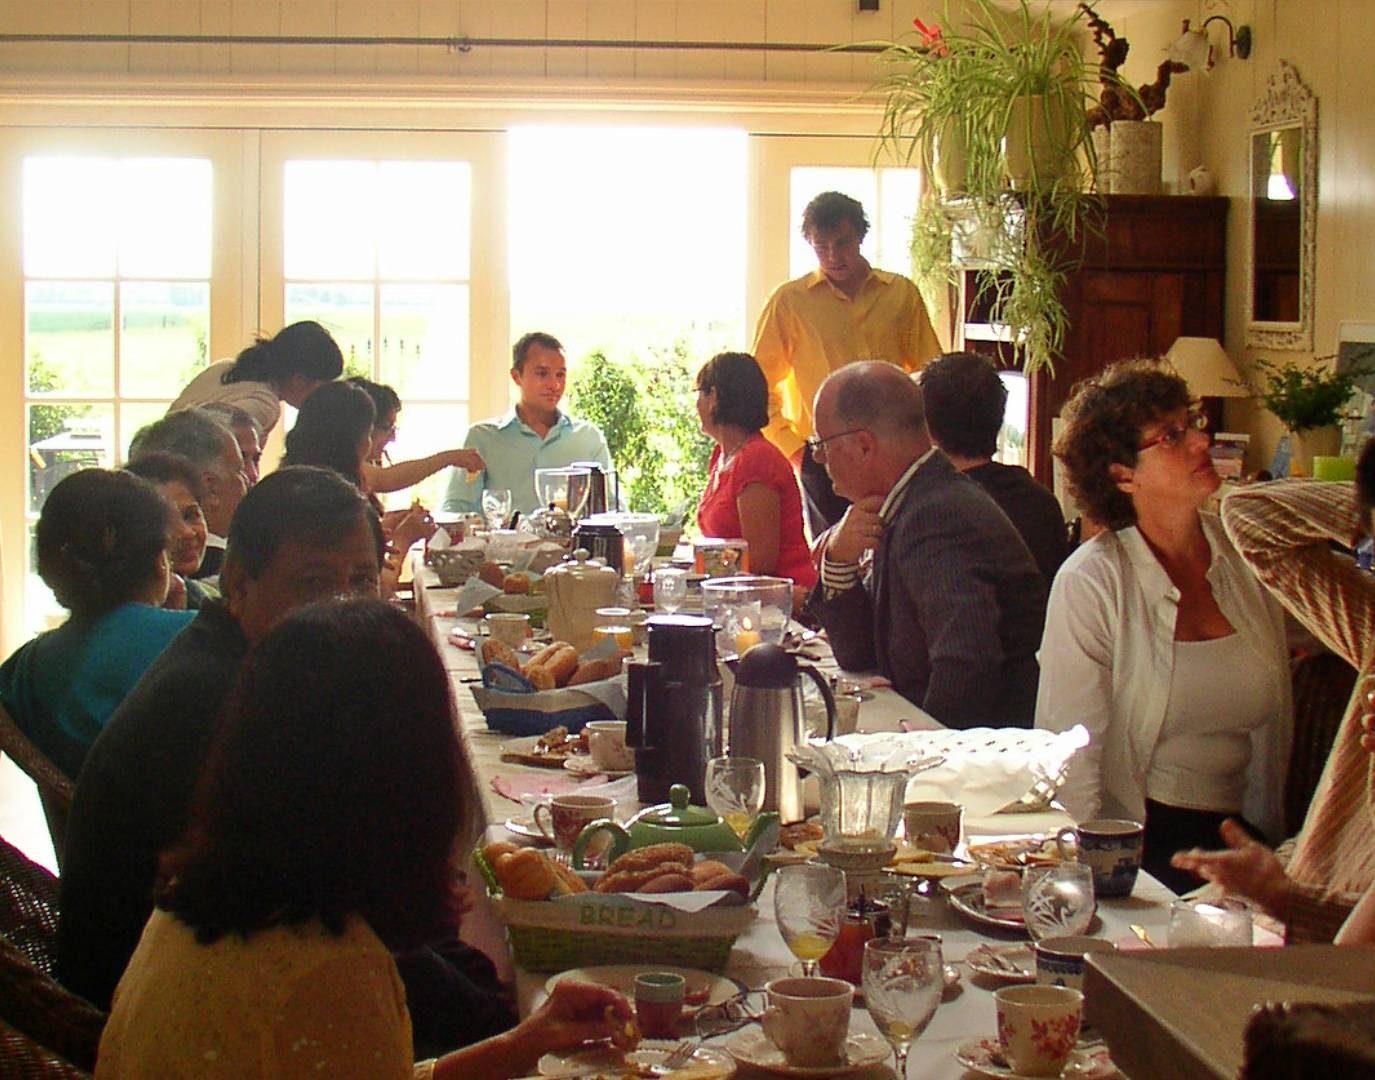 vriendinnenweekend diner verjaardagsfeest reunie overnachting-02